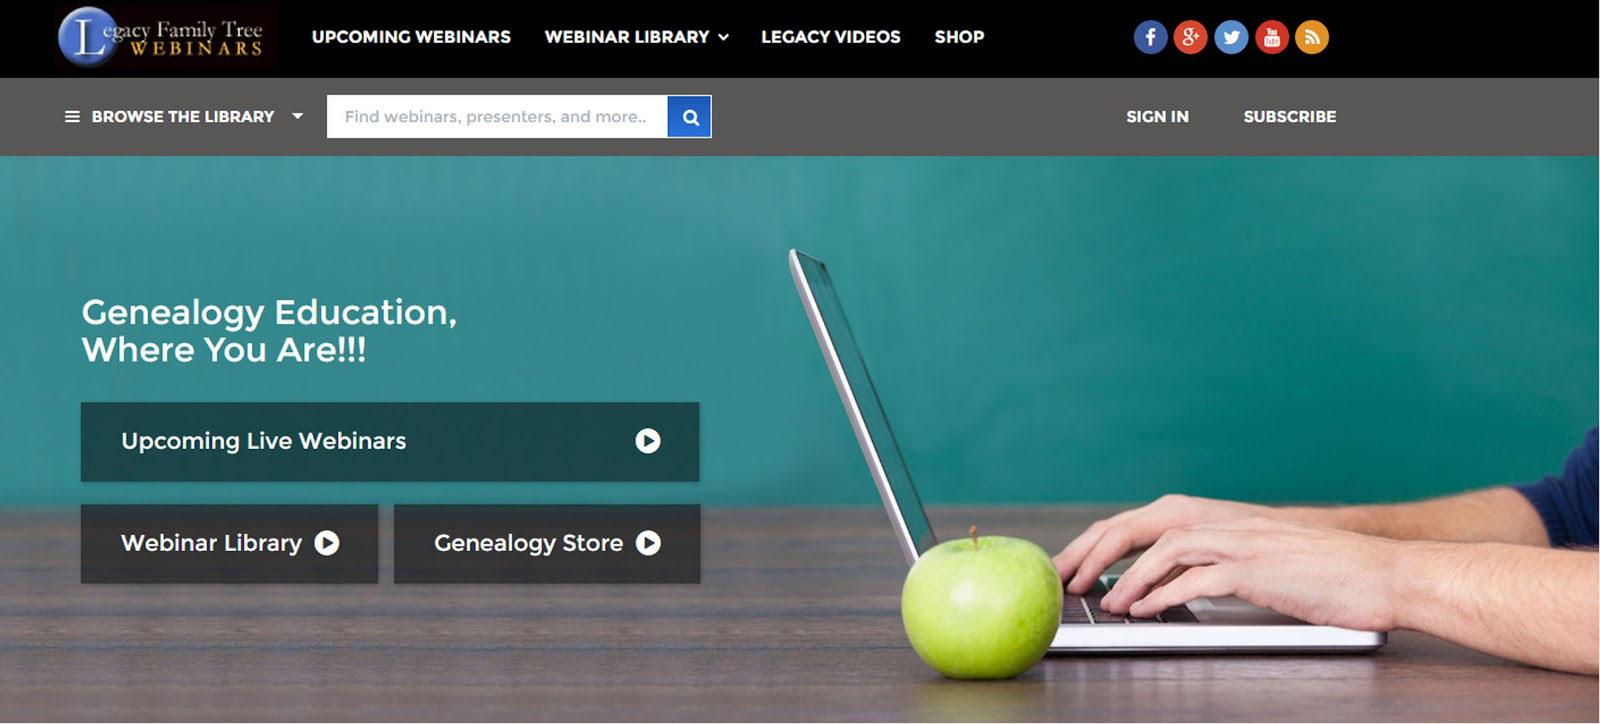 Legacy Family Tree Webinars Site